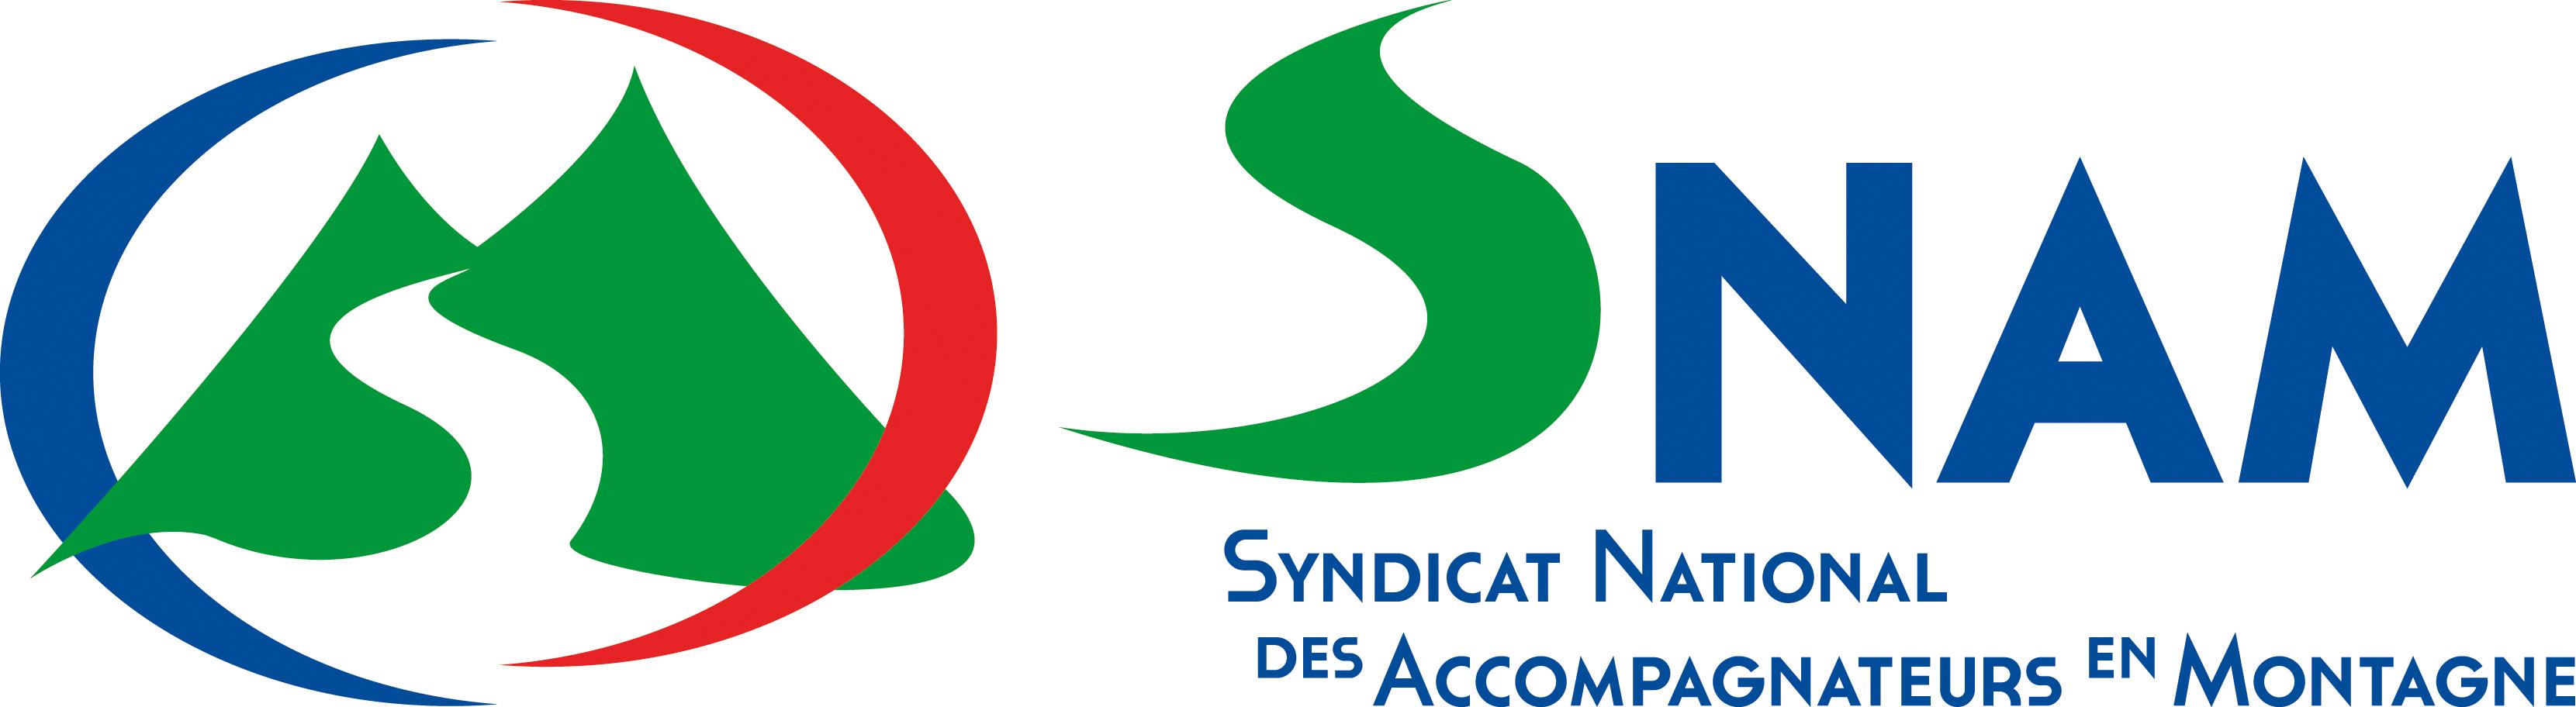 Logo Accompagnateurs en montagne, Massif des Vosges (France)